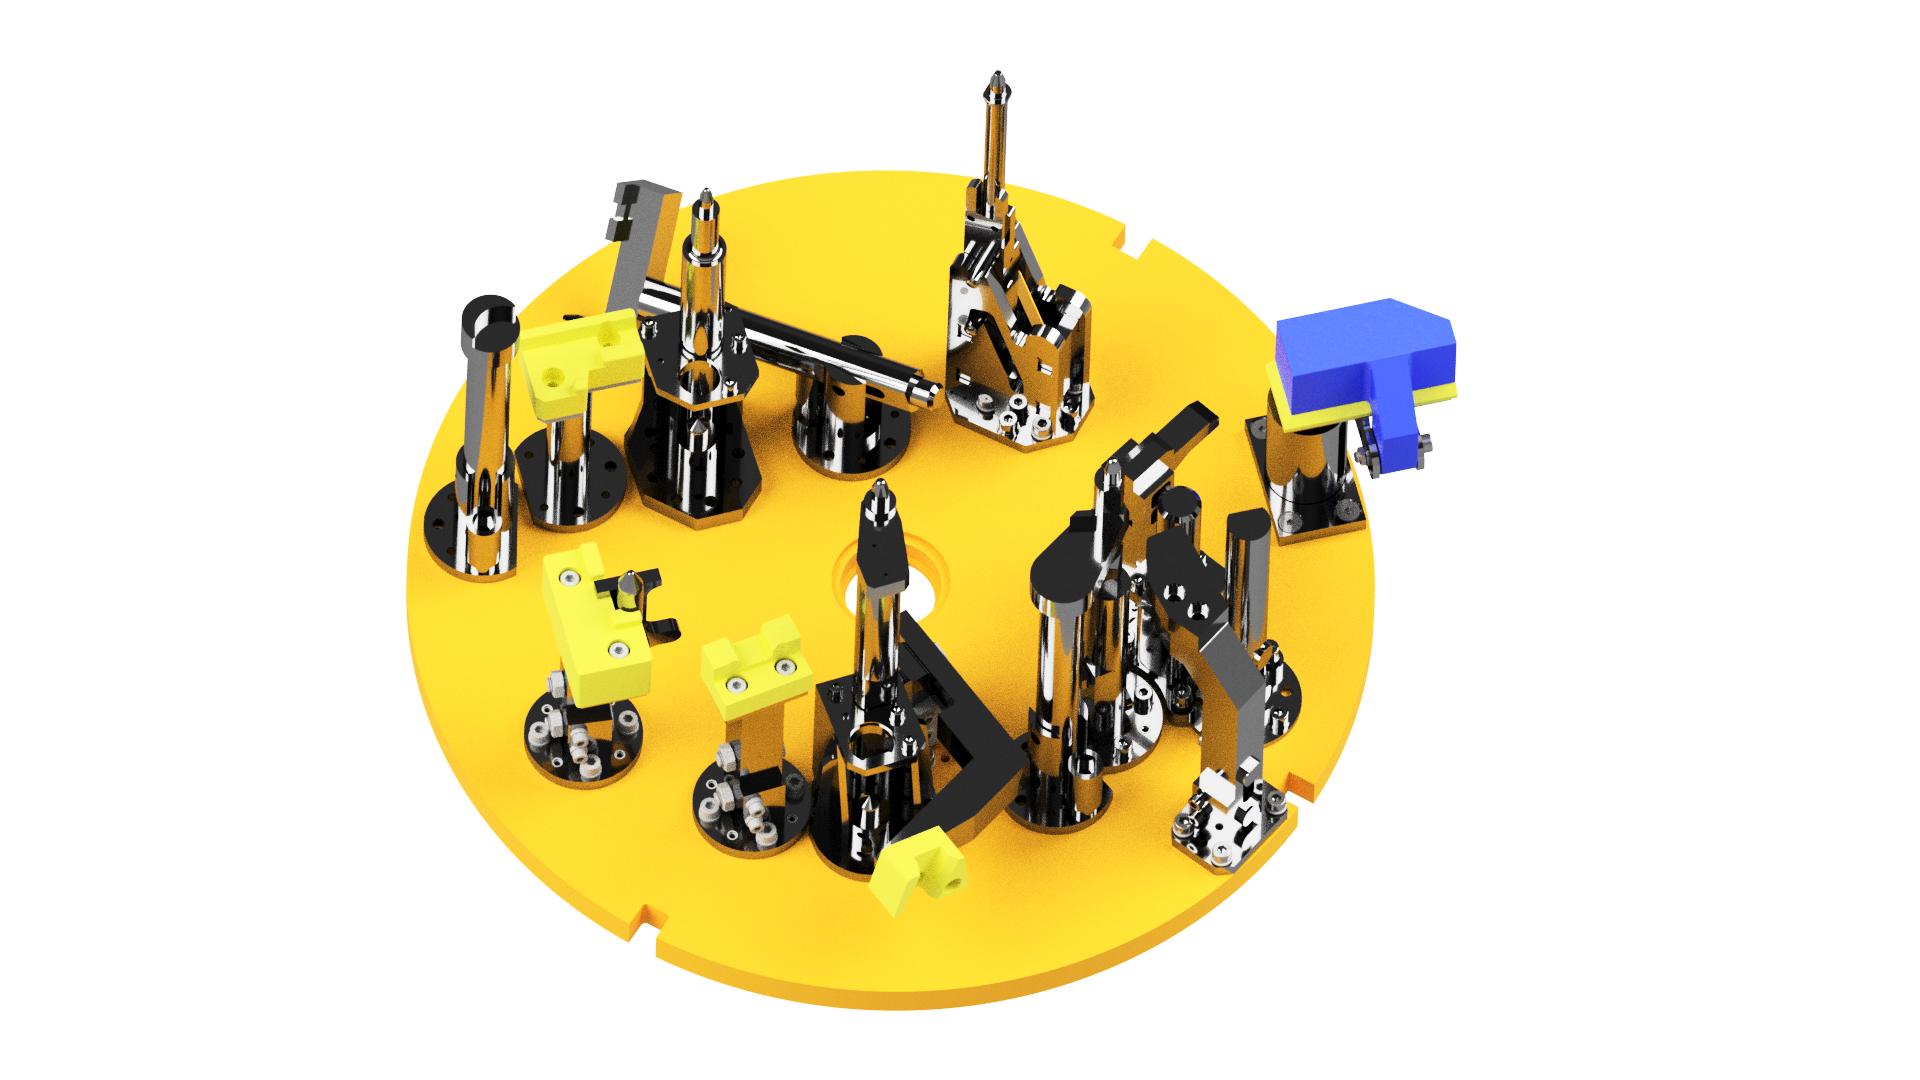 Pallet for an assembly of a propellent automotive unit